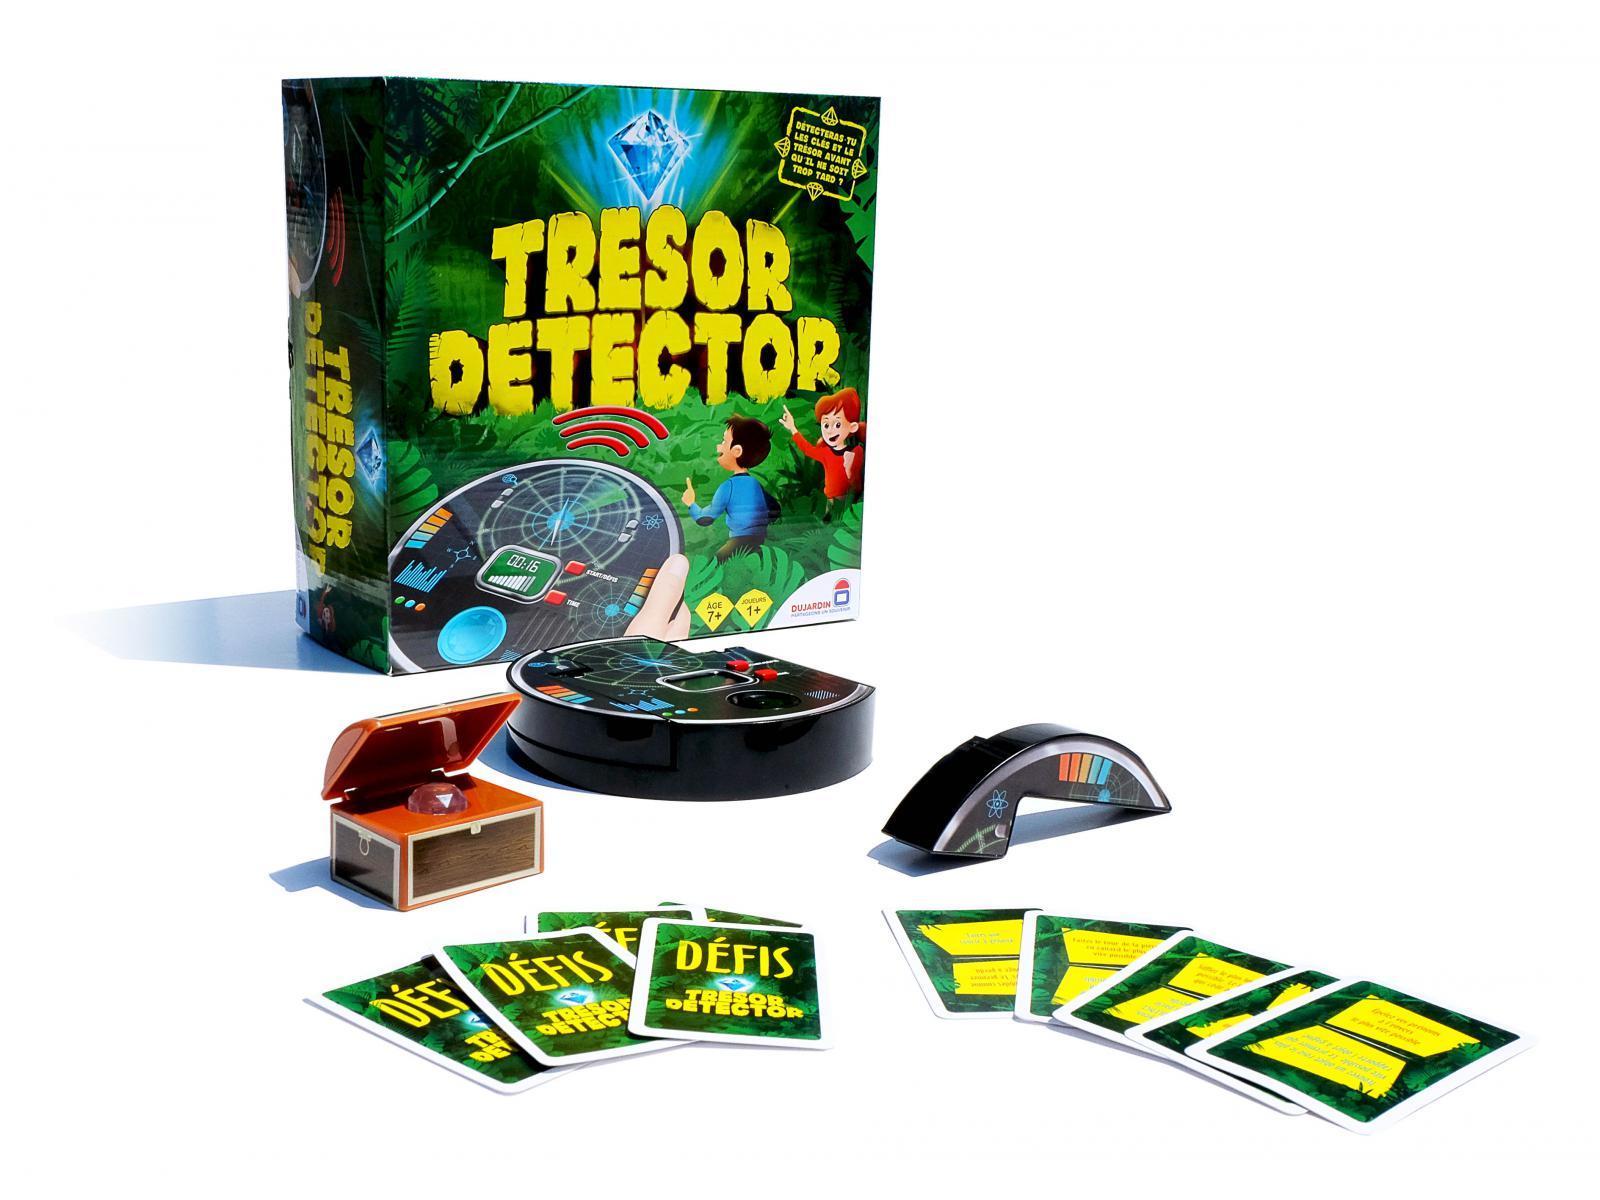 dujardin tresor detector 41270 pas cher achat vente jeux d 39 adresse rueducommerce. Black Bedroom Furniture Sets. Home Design Ideas